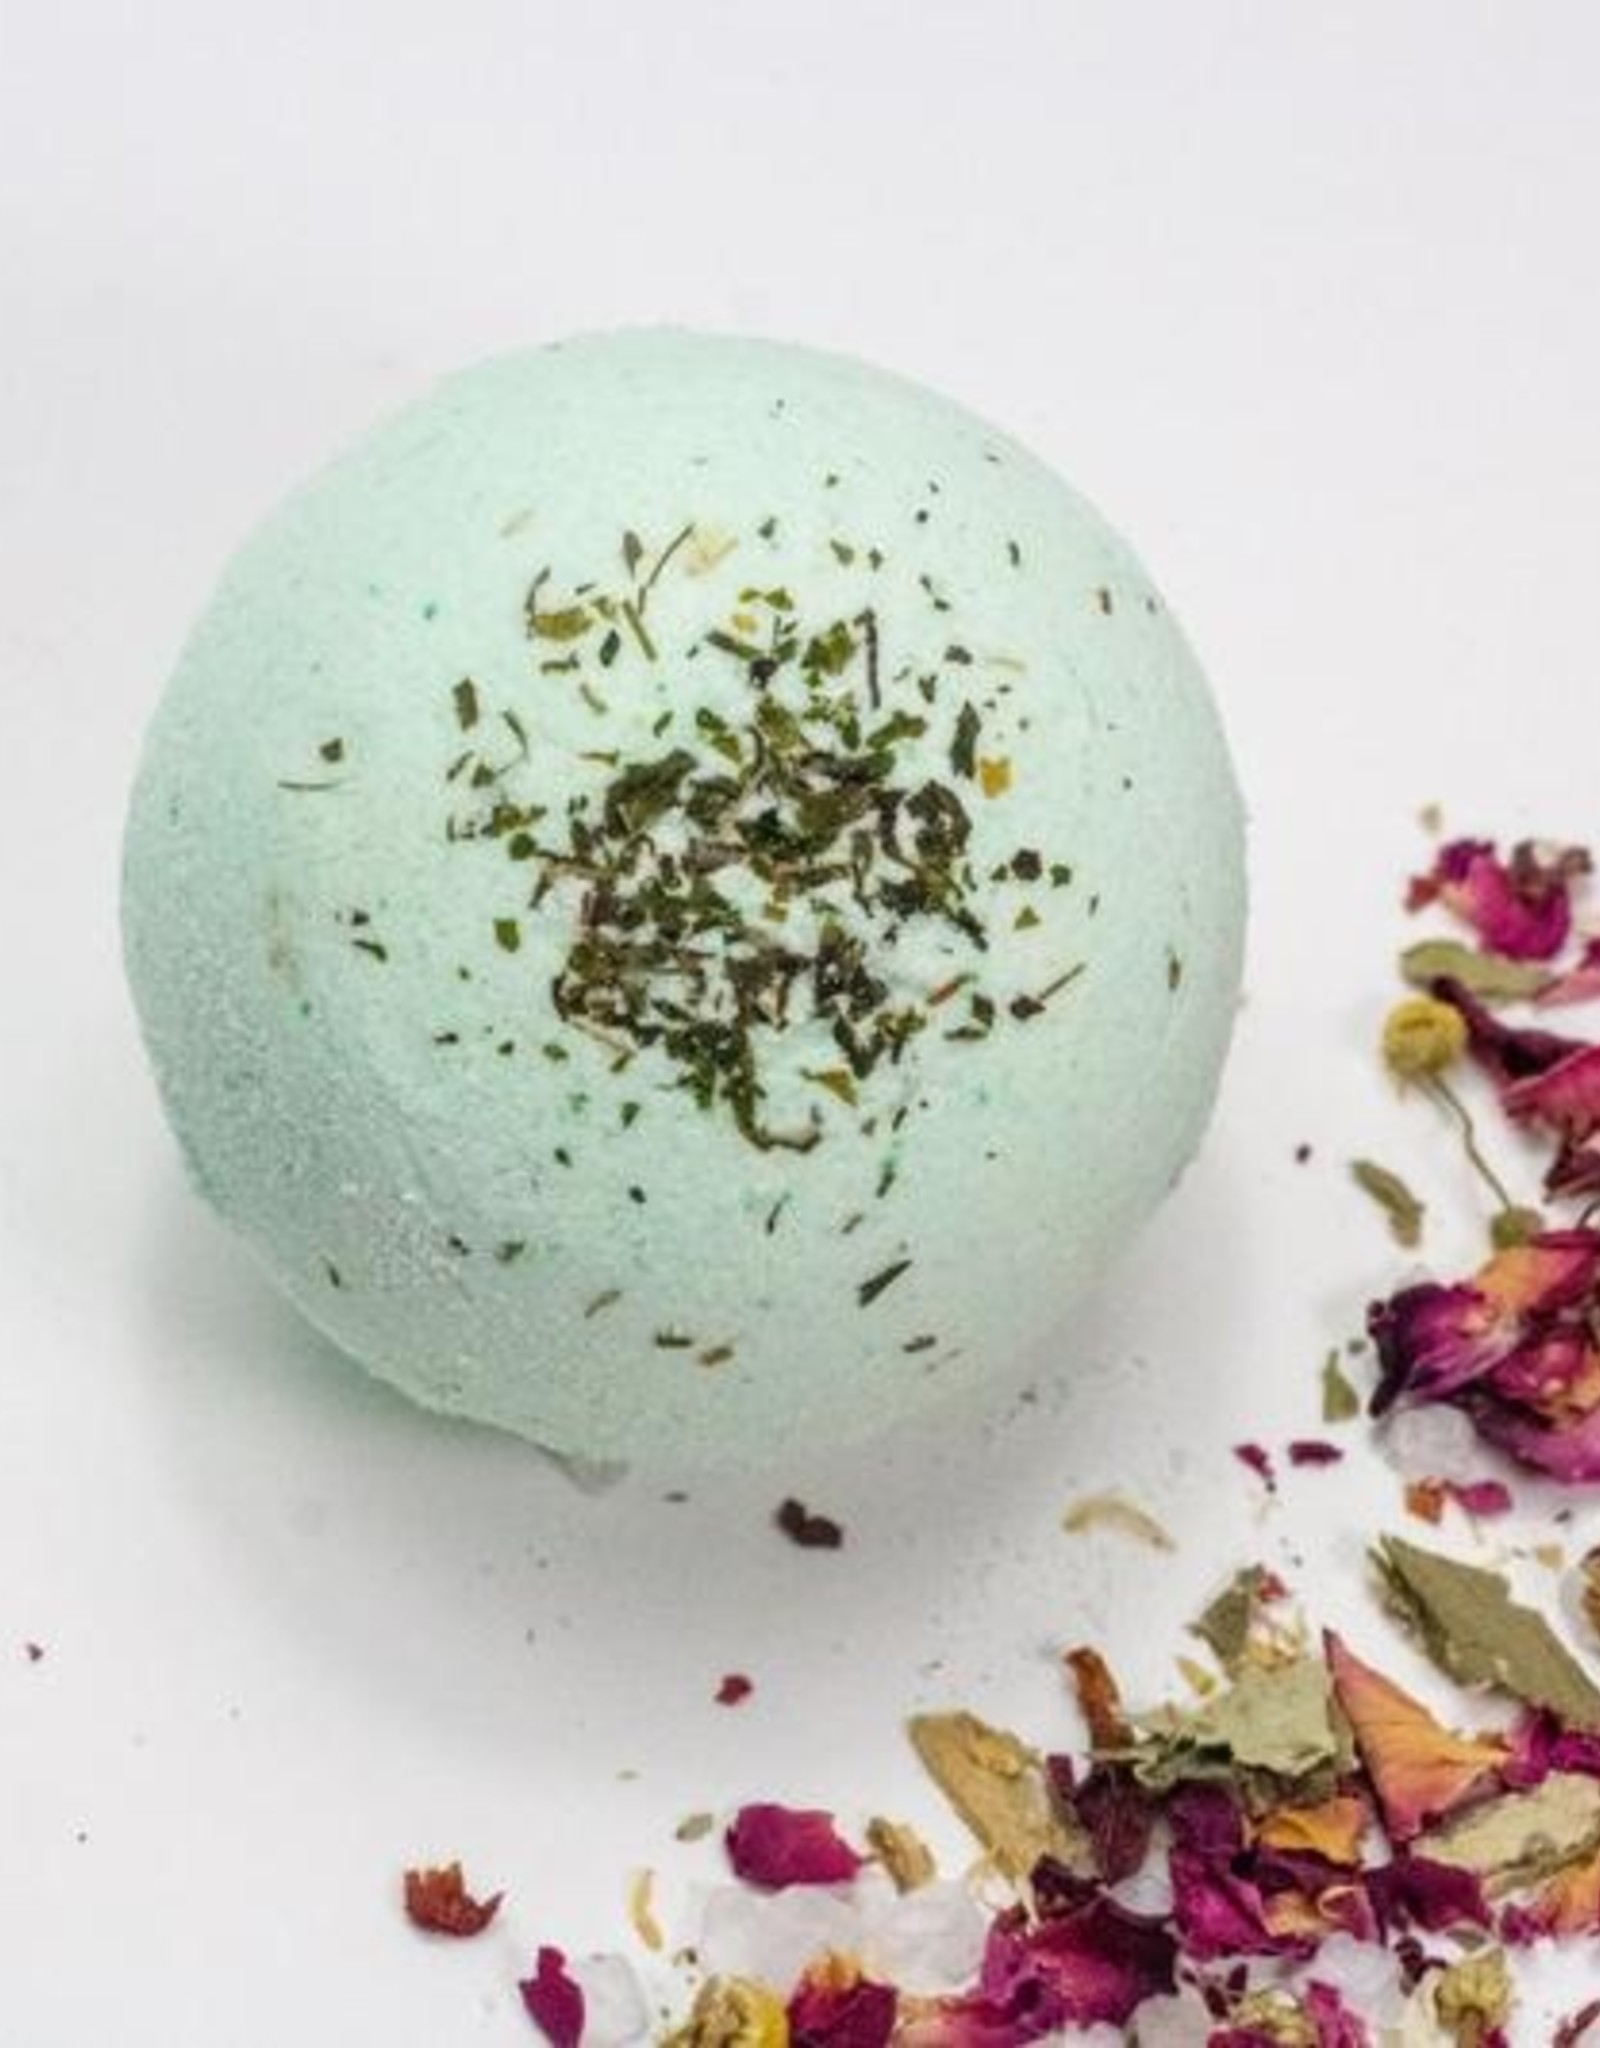 NaturalAmor Peppermint Tea Bath Bomb